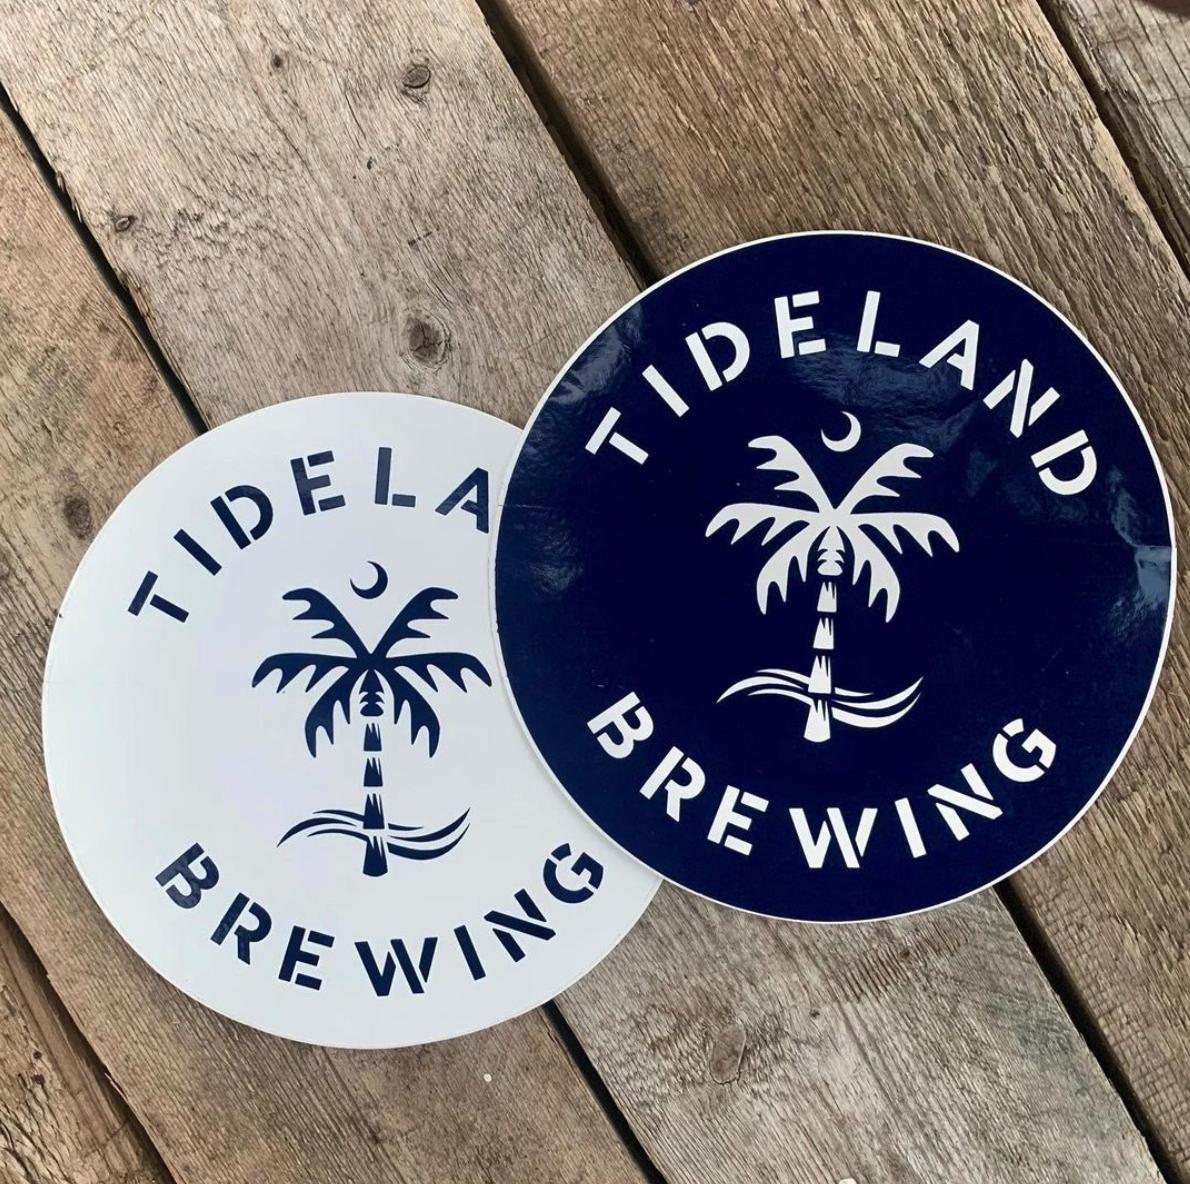 Tideland Brewing Stickers